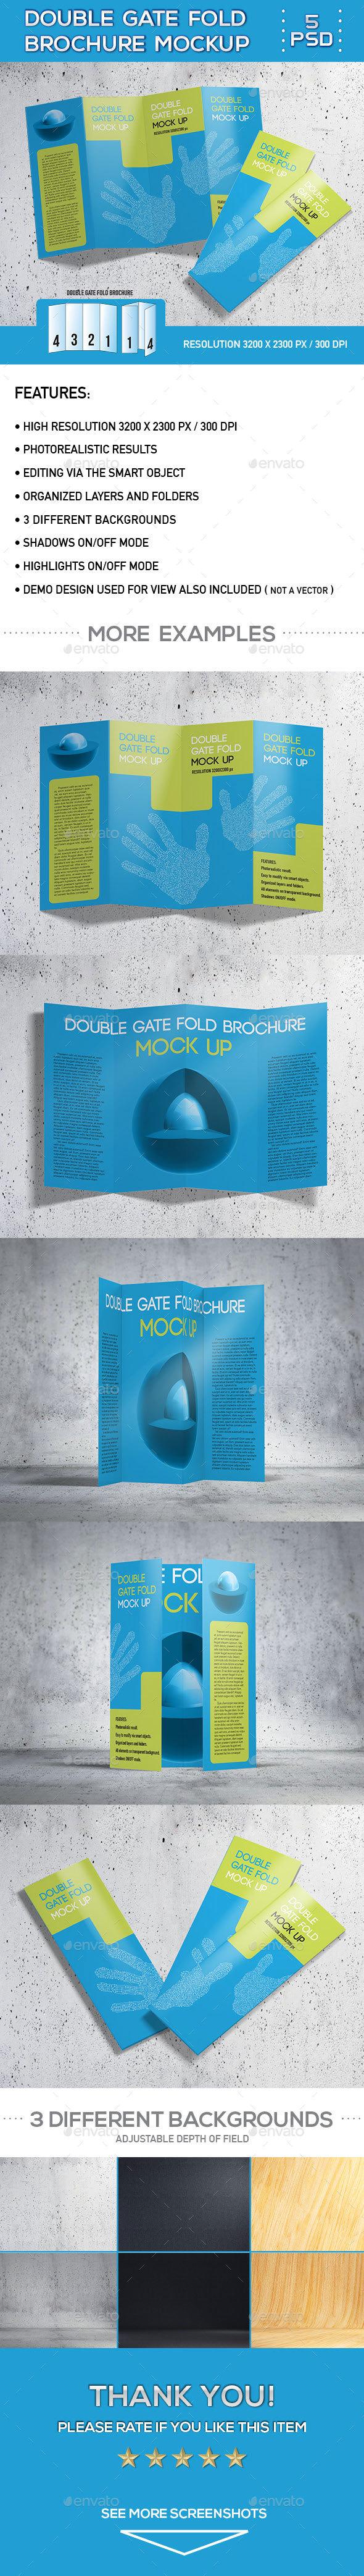 Double Gate Fold Brochure MockUp by wuka – Gate Fold Brochure Mockup